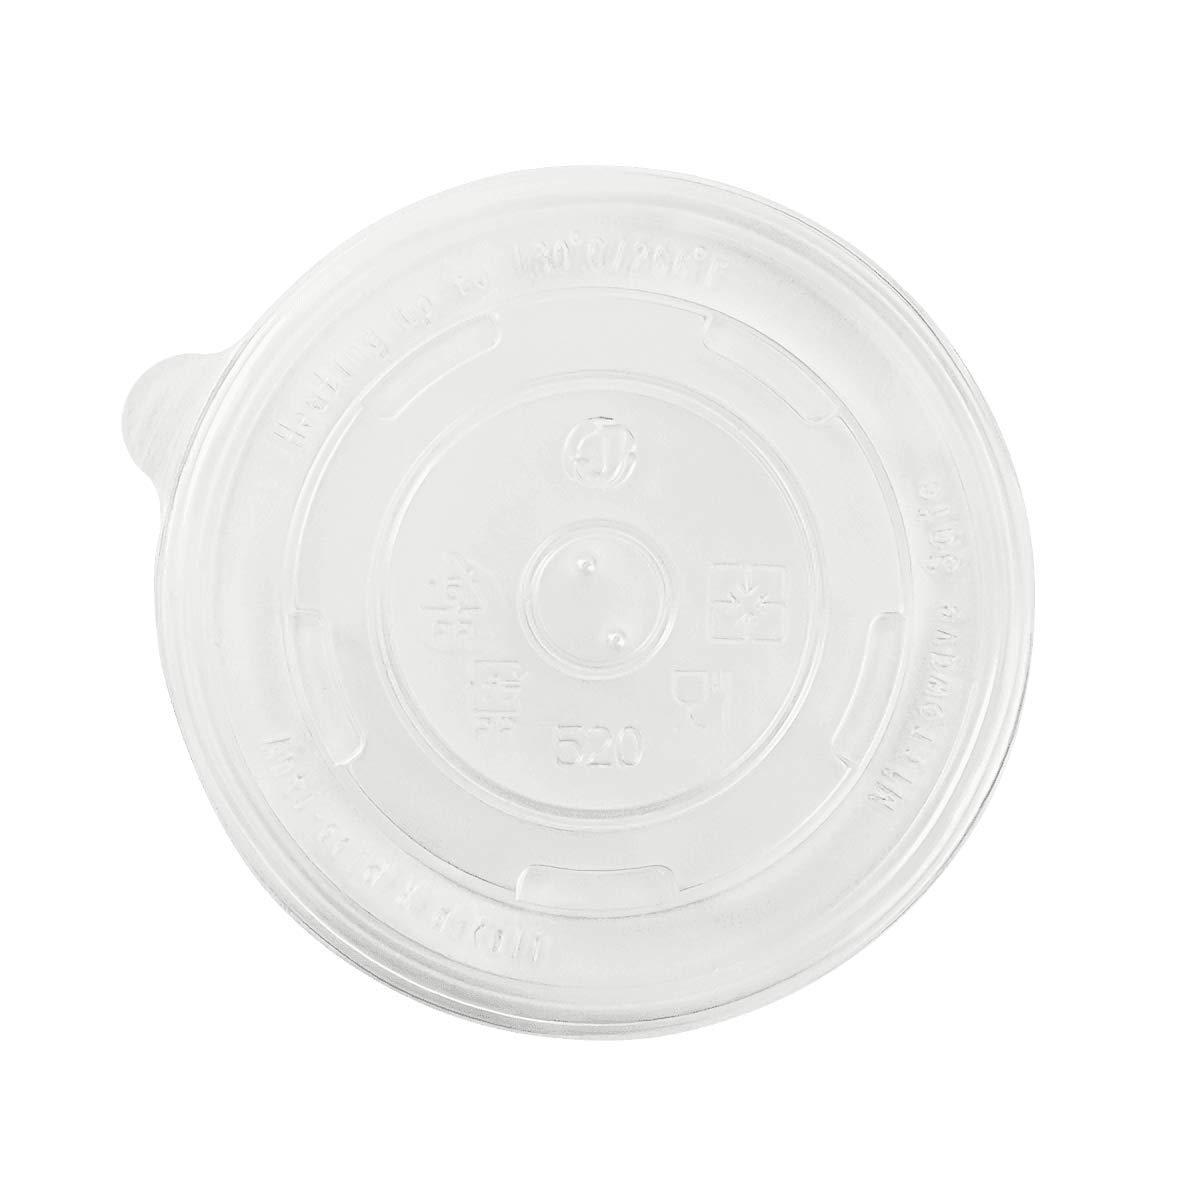 Karat C-KDL112-PP PP Flat Lid for 16 oz Paper Food Container (Case of 1000)